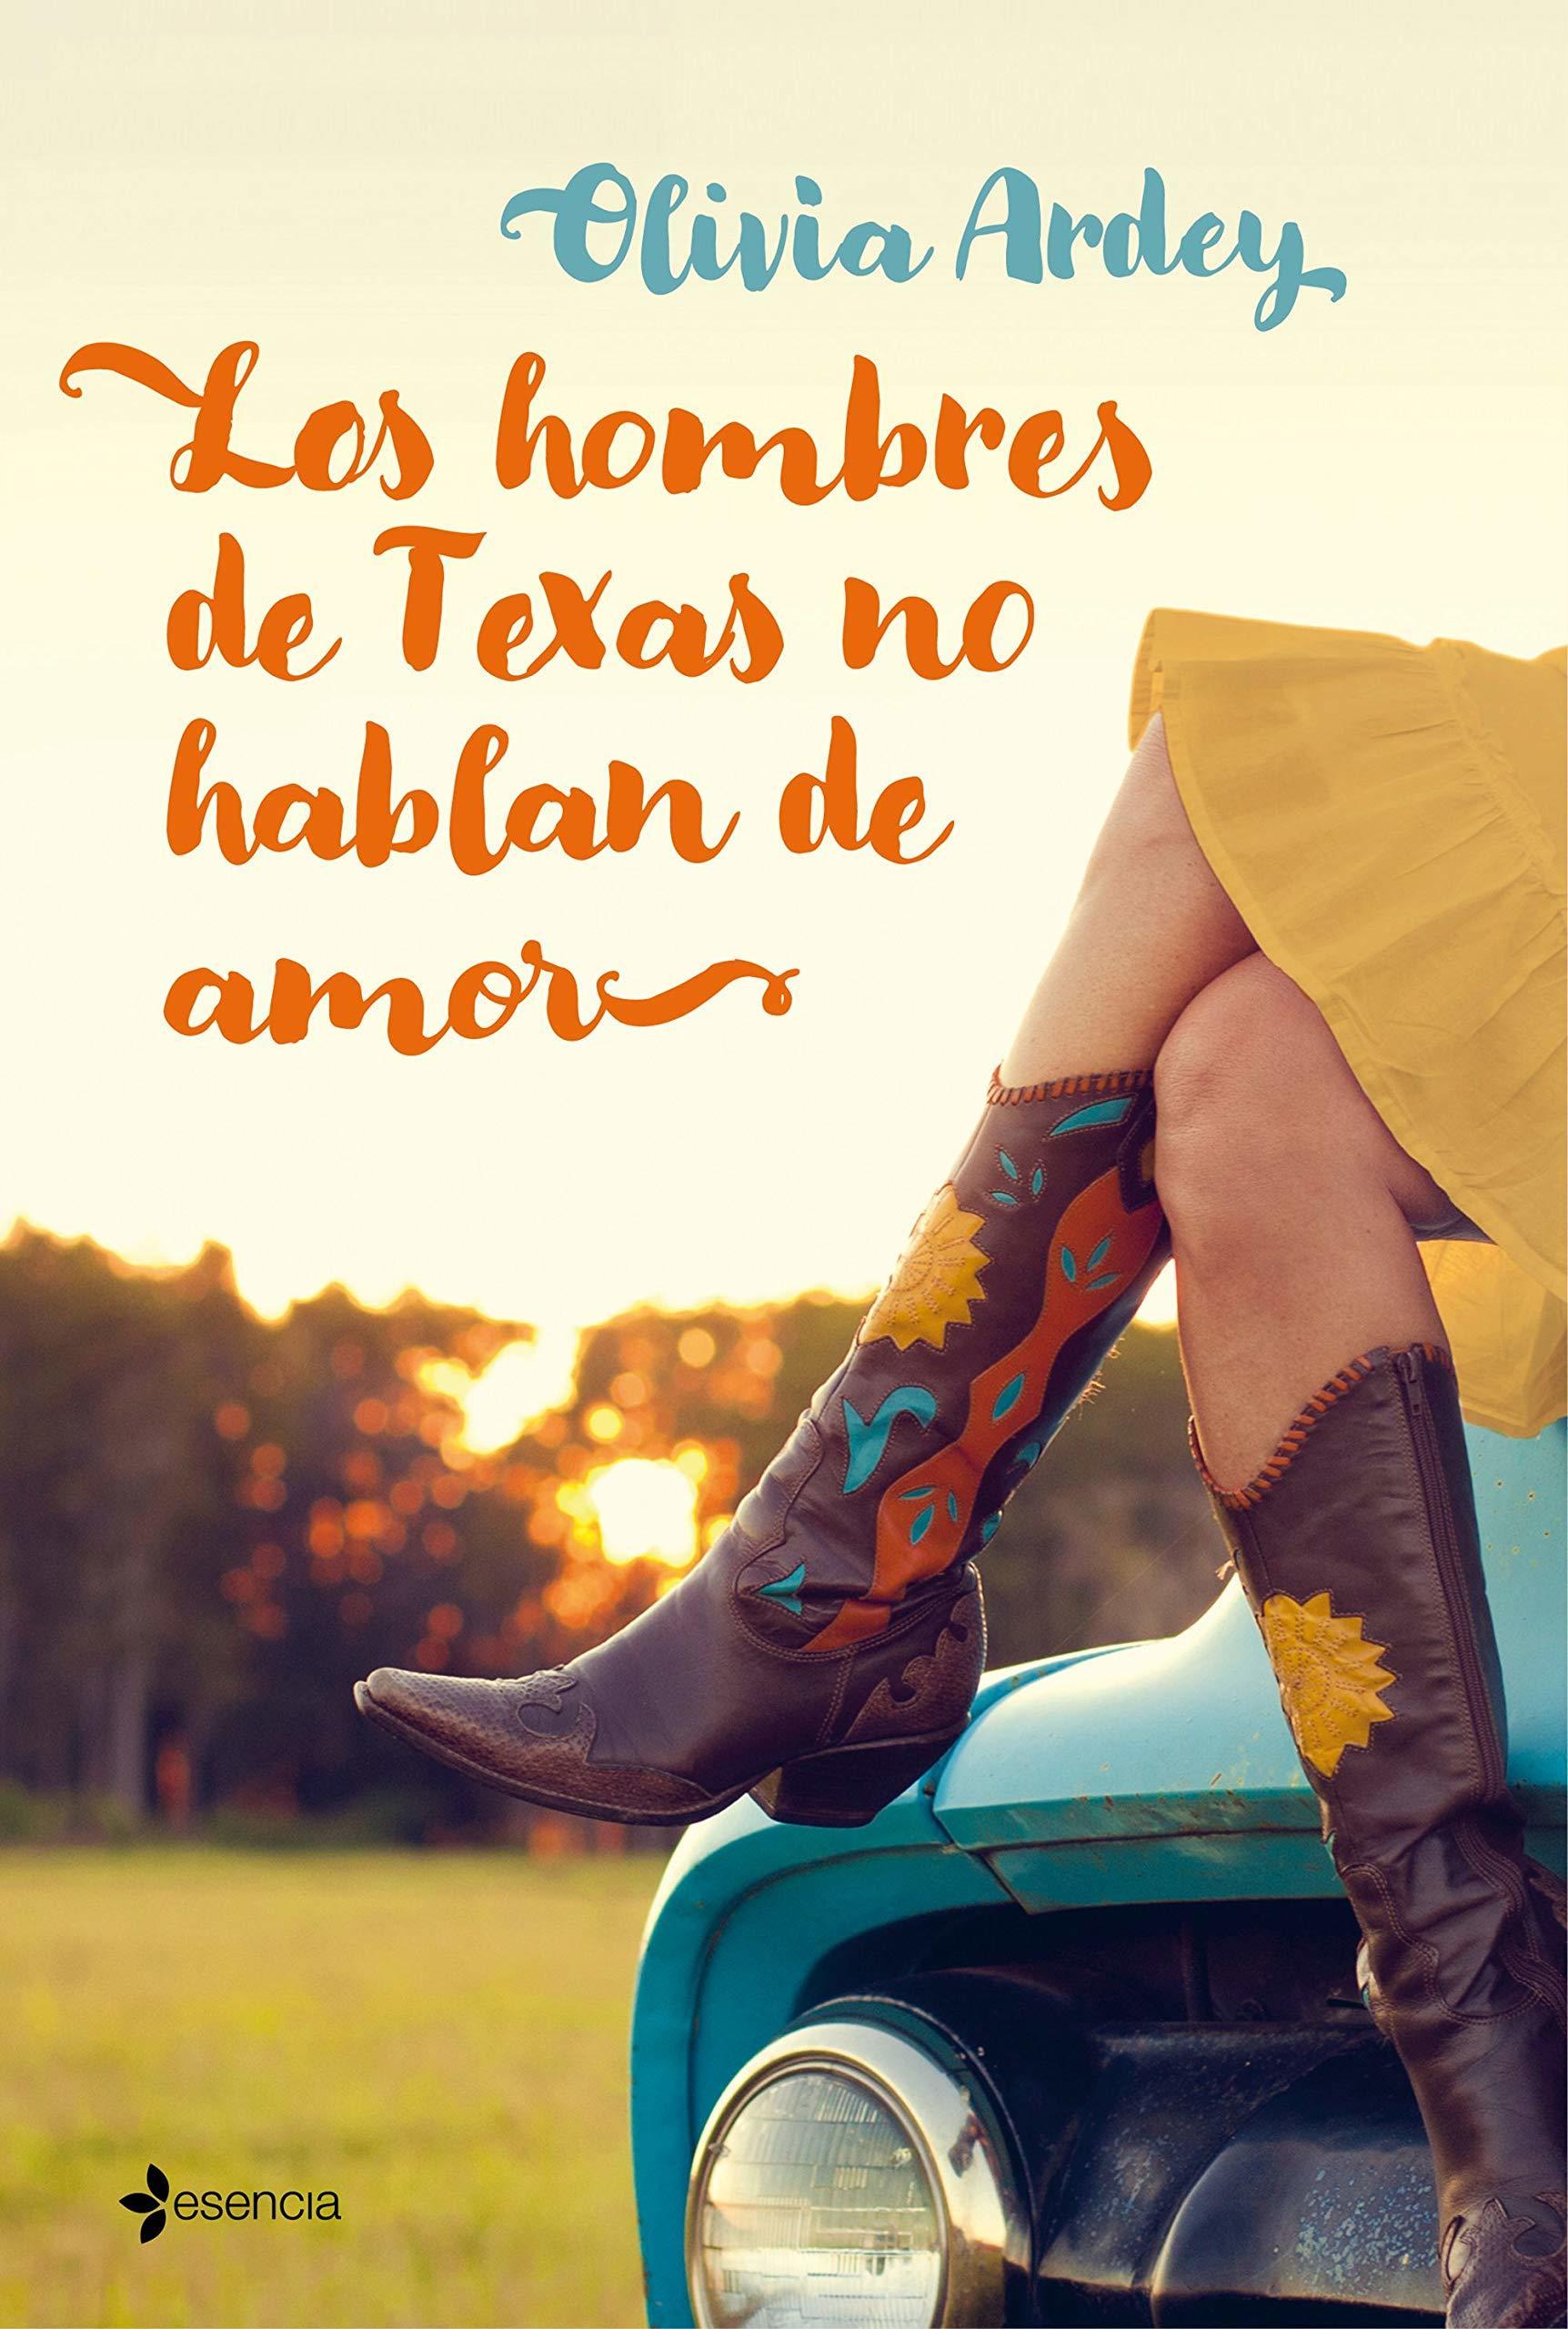 Olivia Ardey: <em>Los hombres de Texas no hablan de amor</em>.